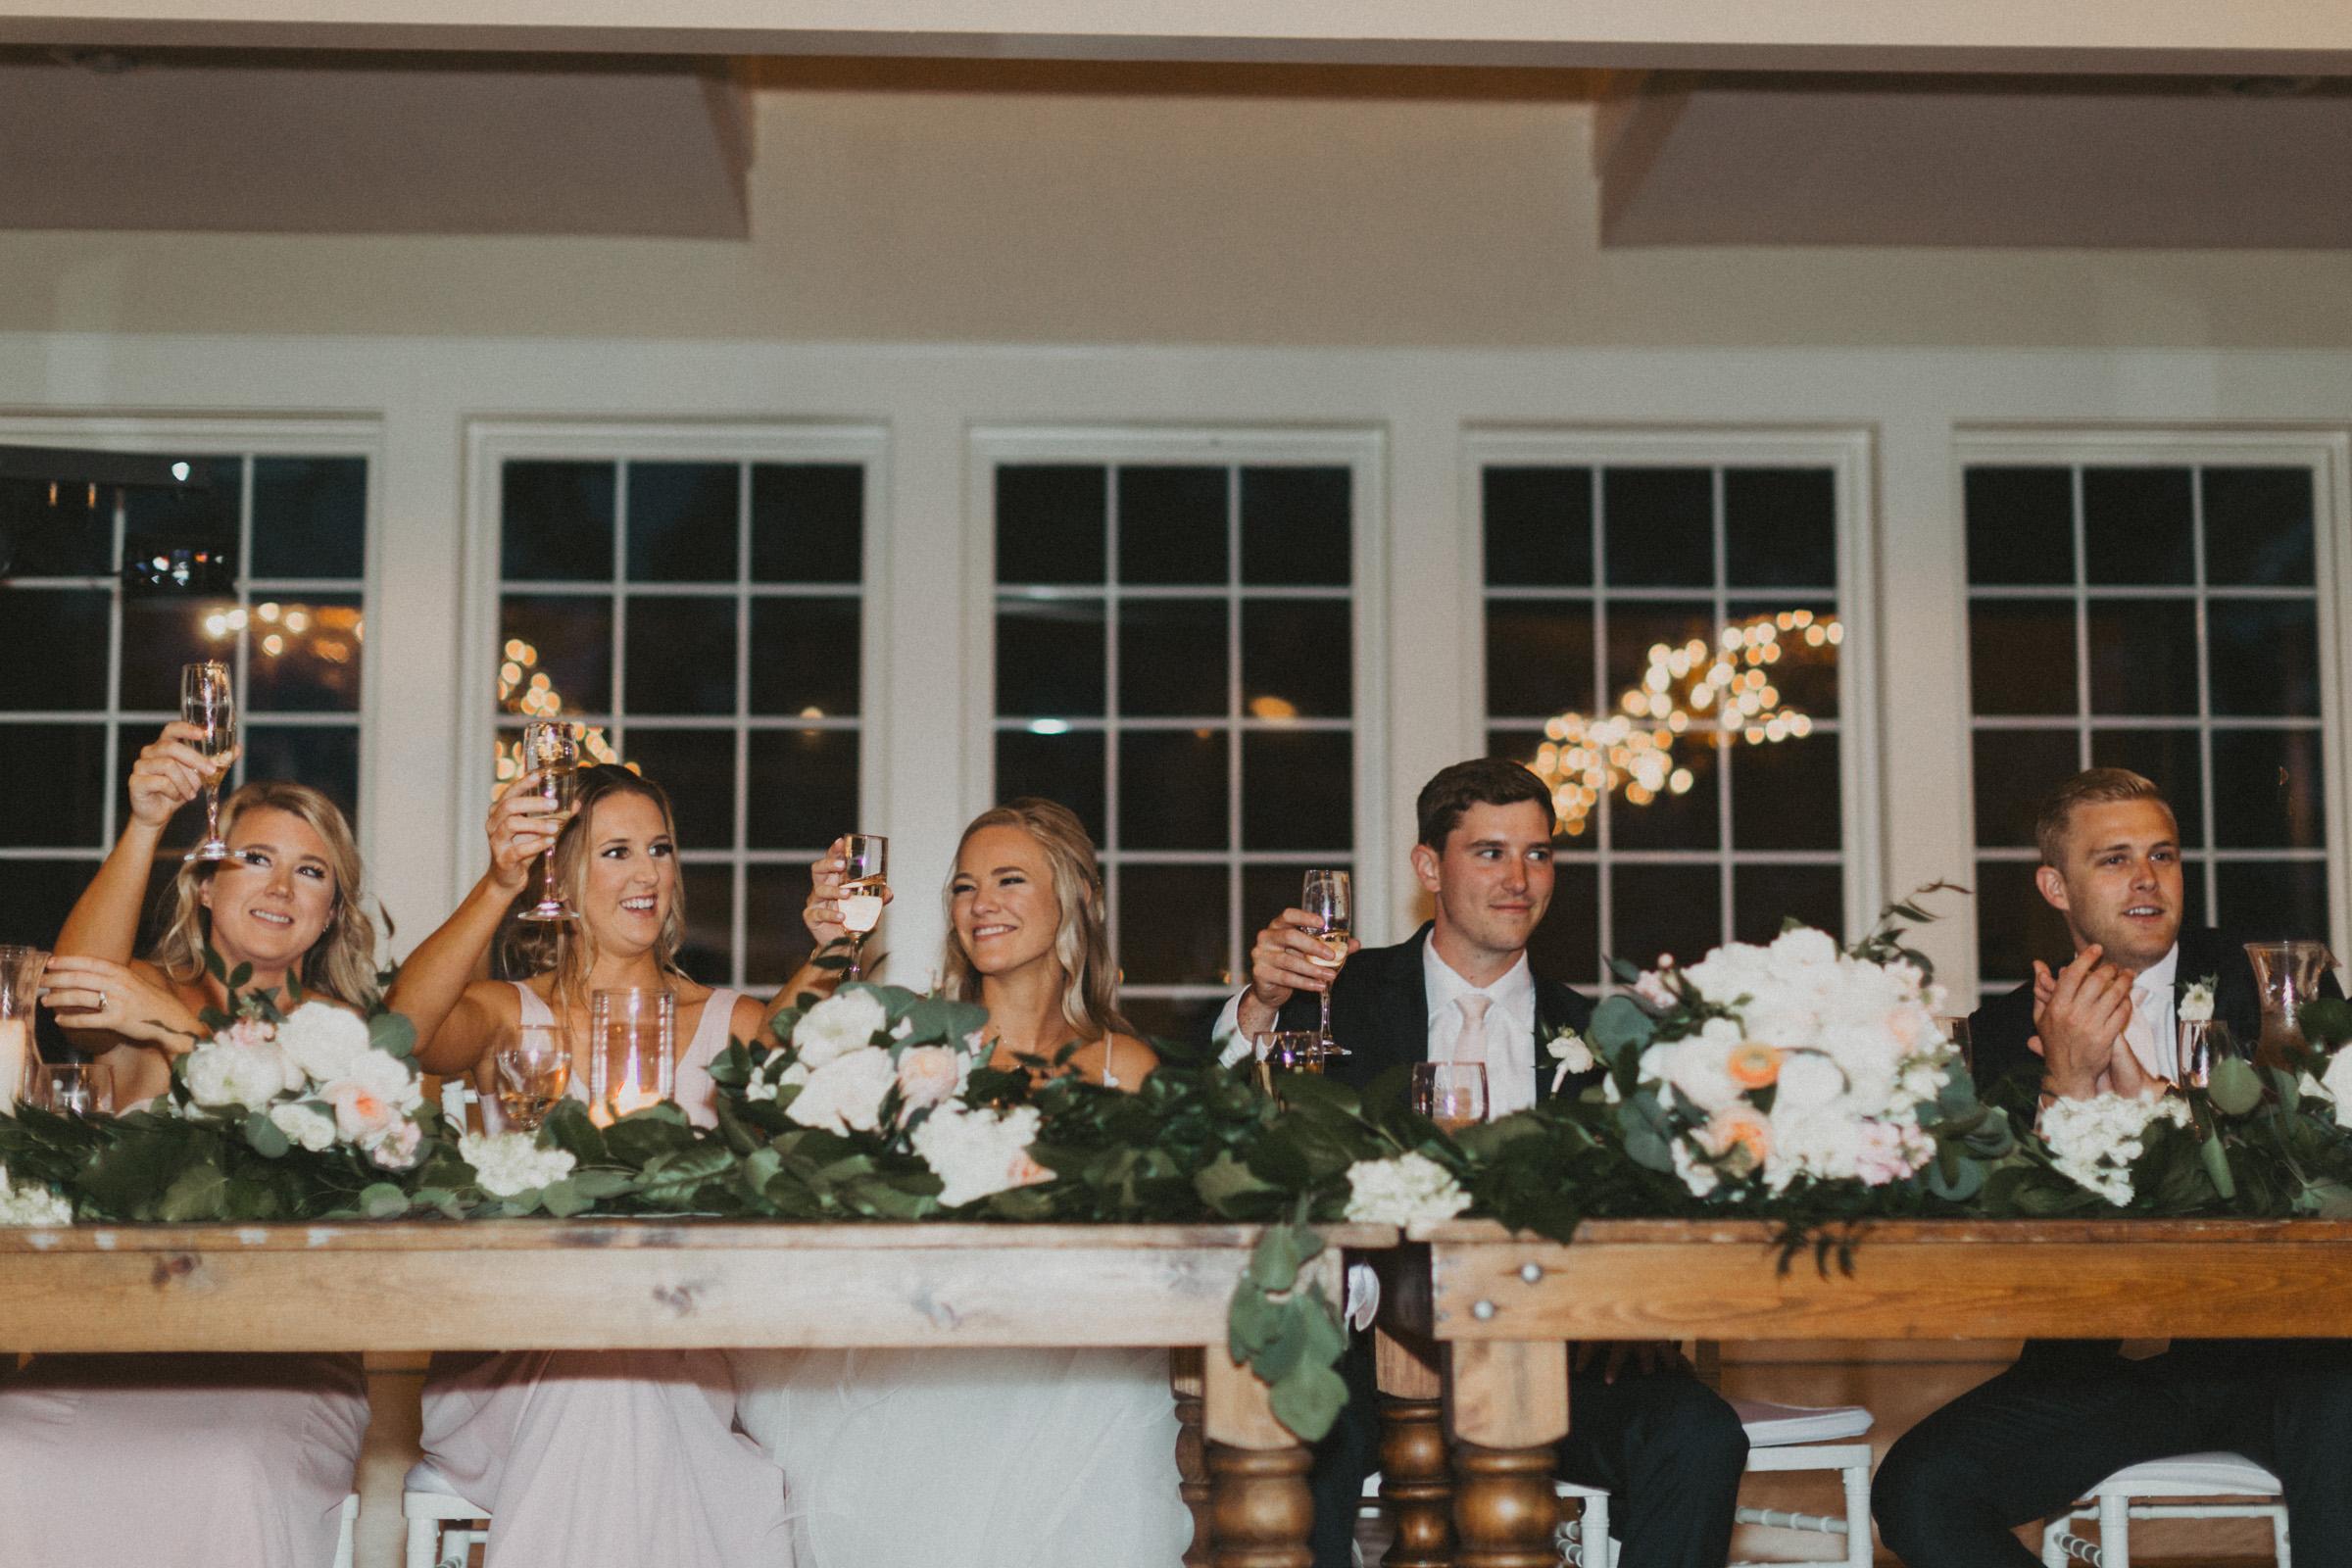 alyssa barletter photography hawthorne house summer outdoor wedding southern charm inspiration-69.jpg